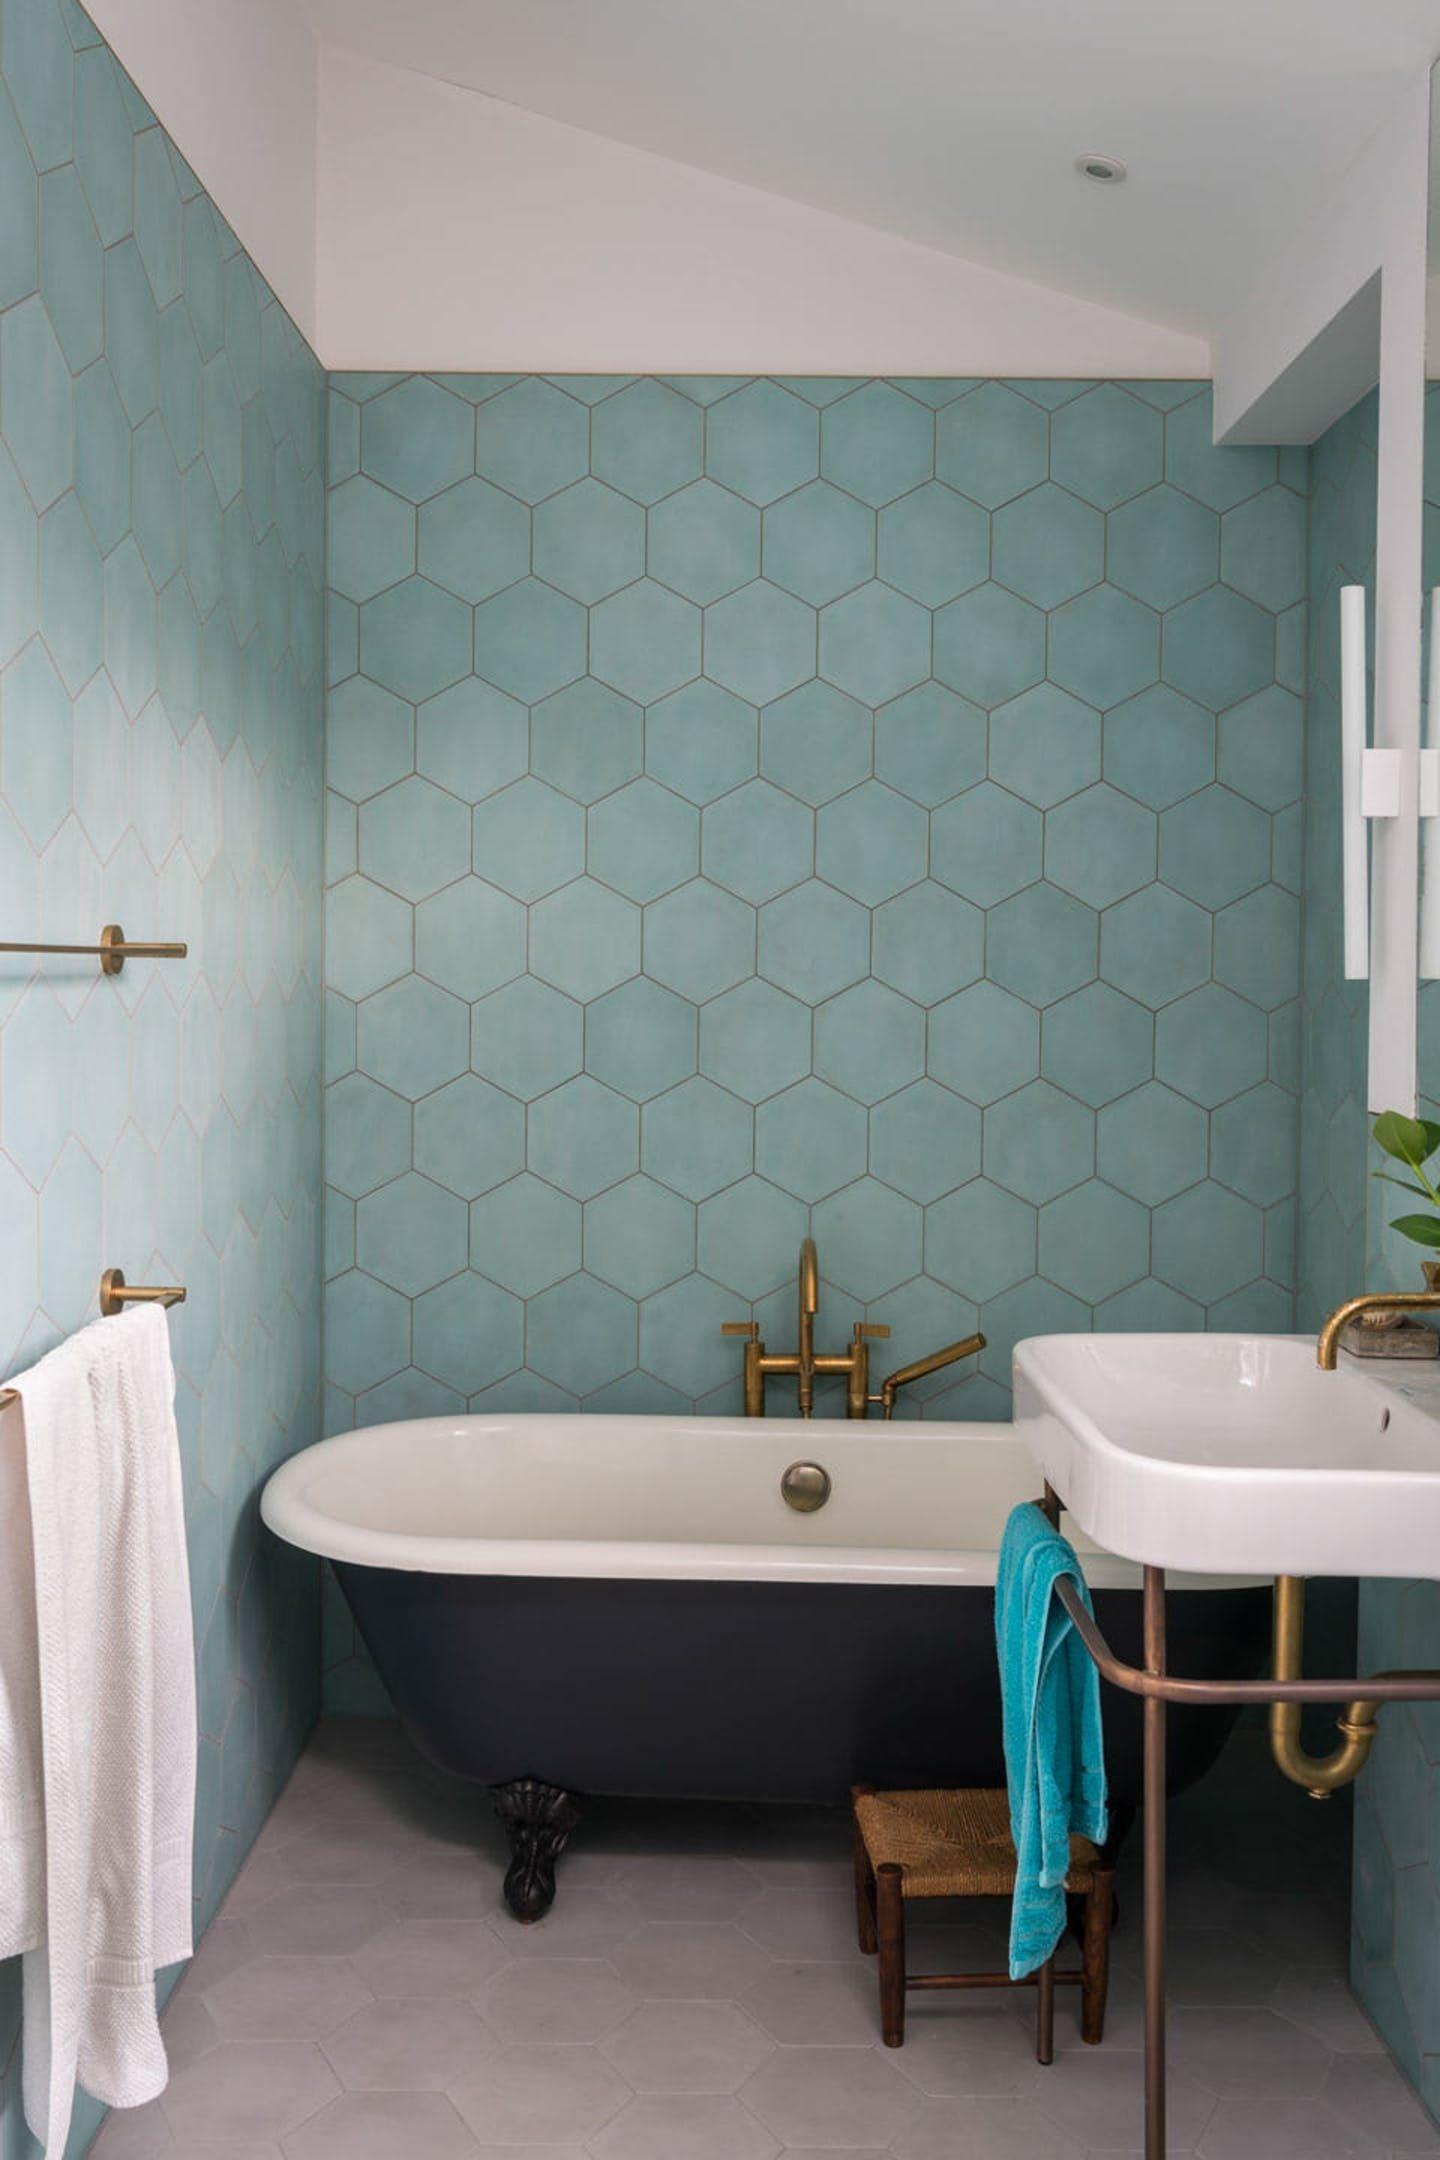 london fields house wall tiles design trendy bathroom on wall tile id=43219